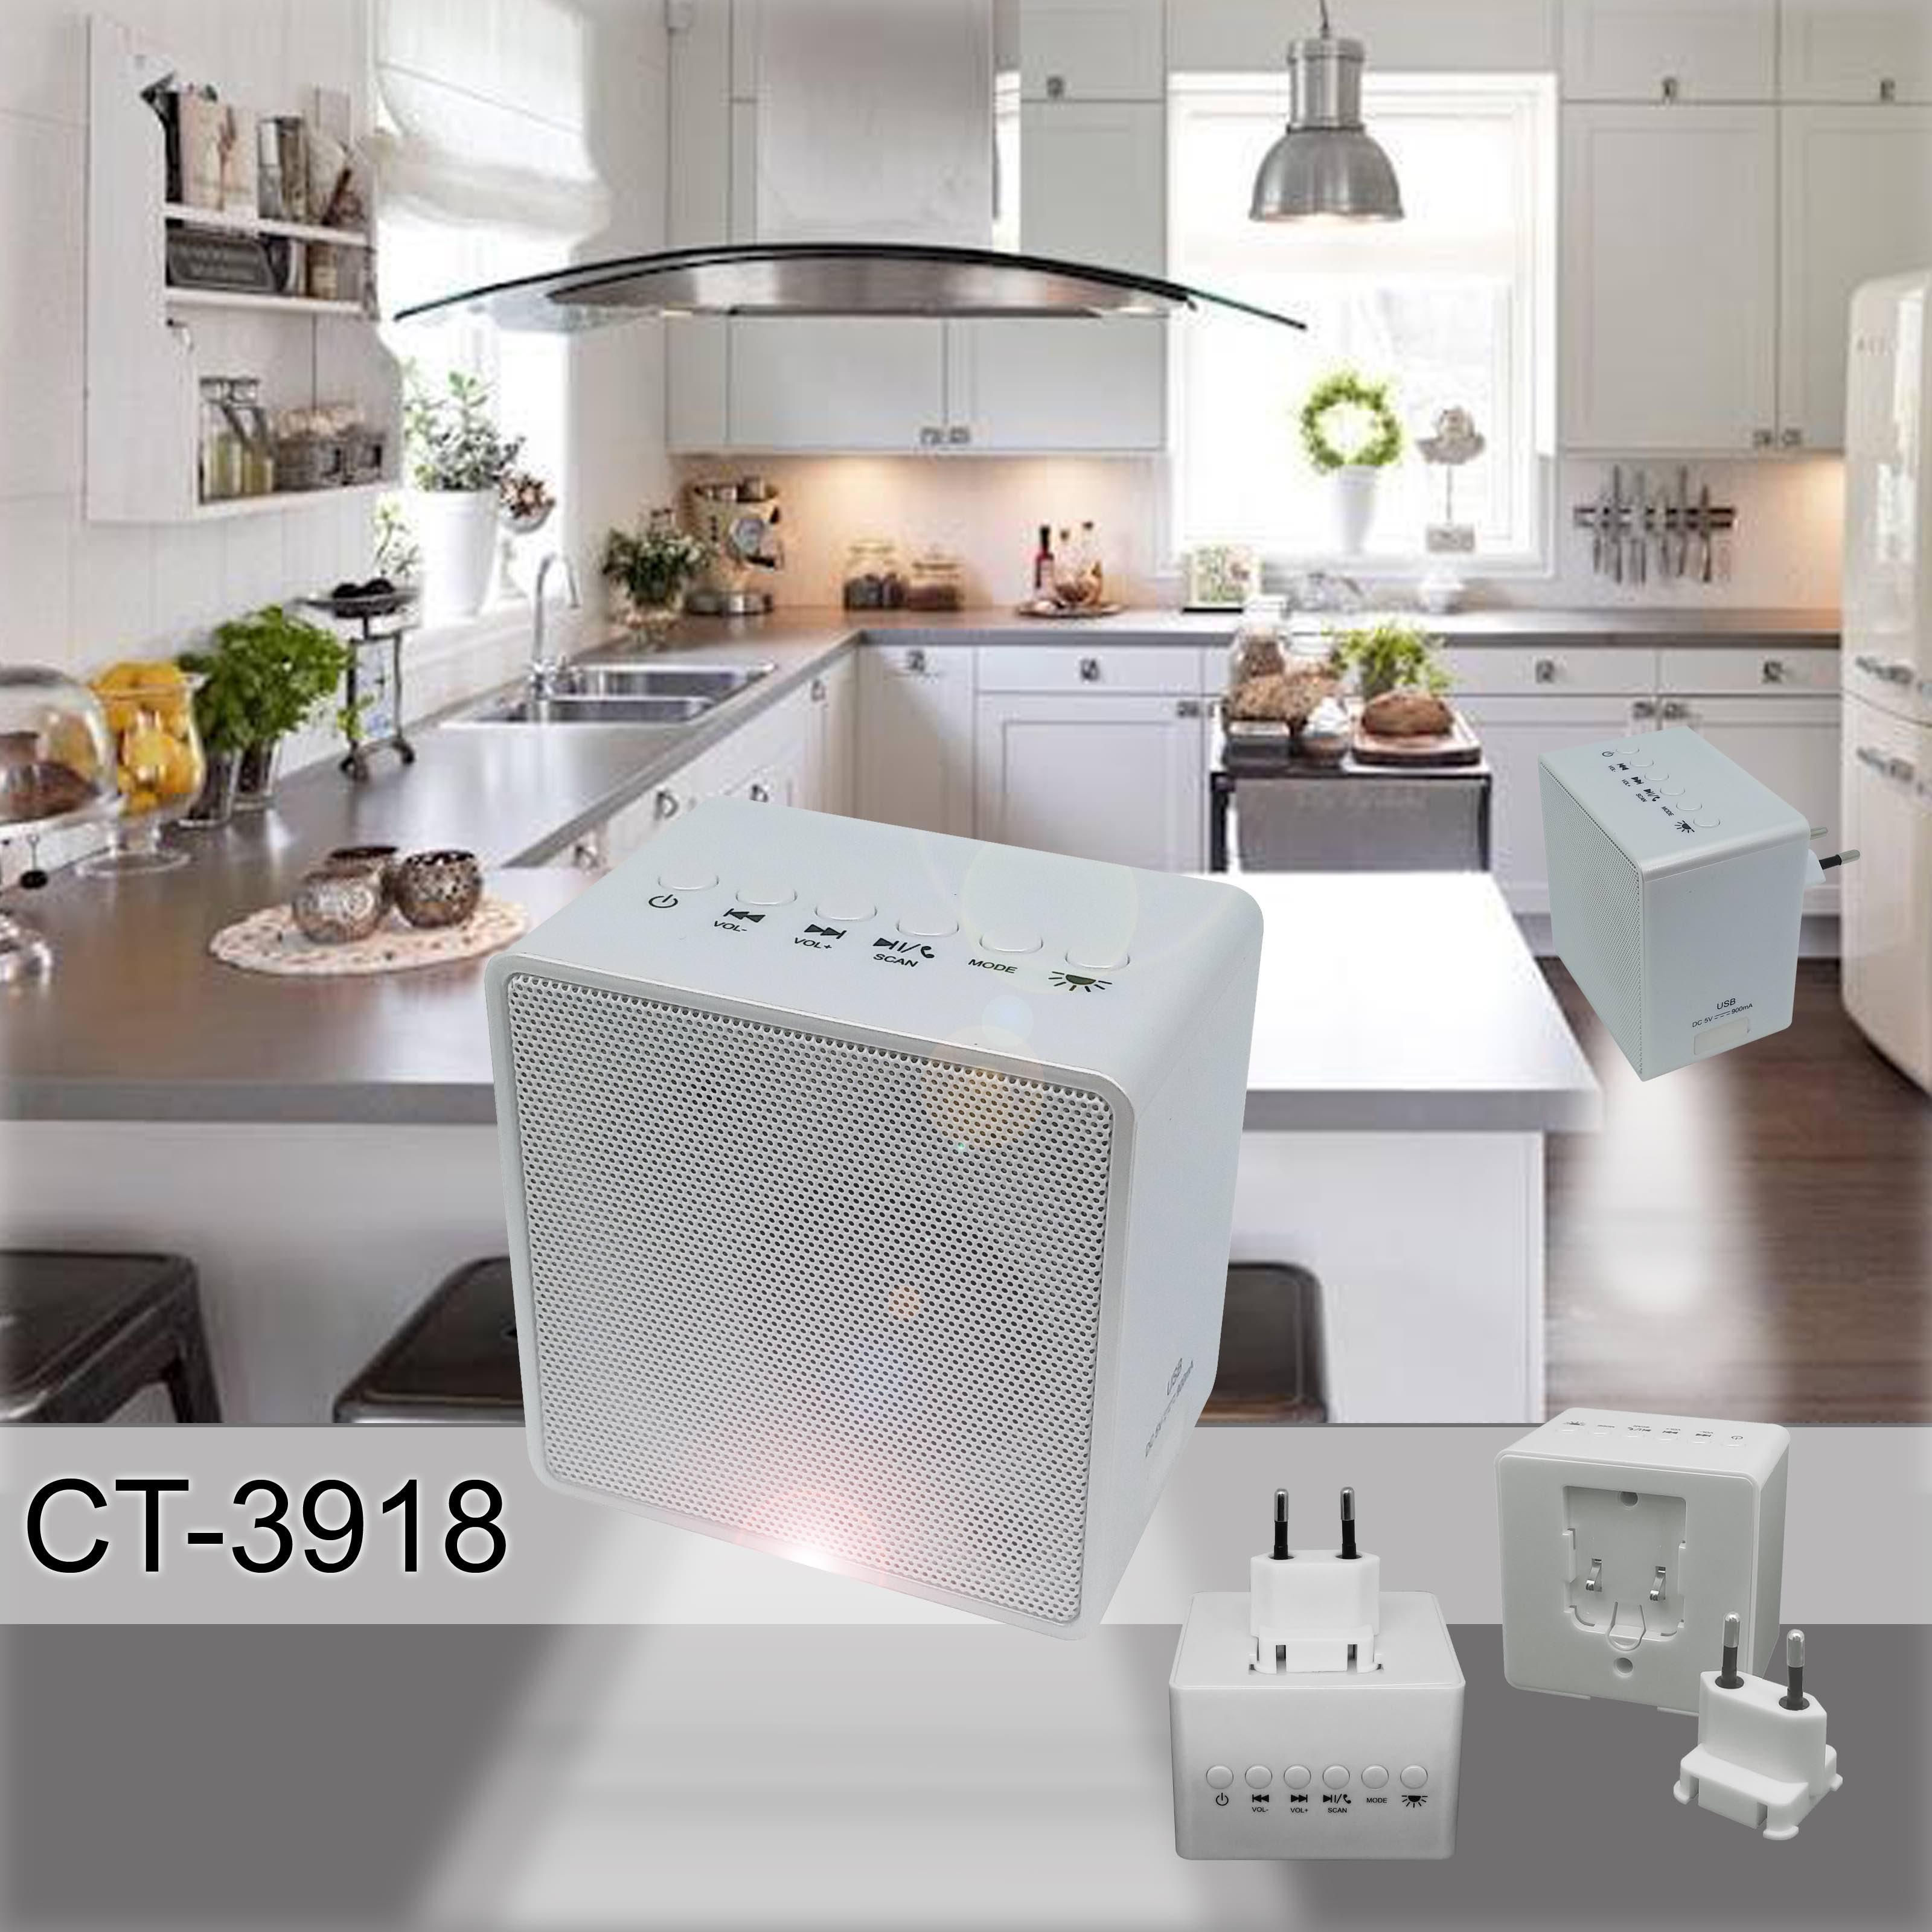 CT-3918